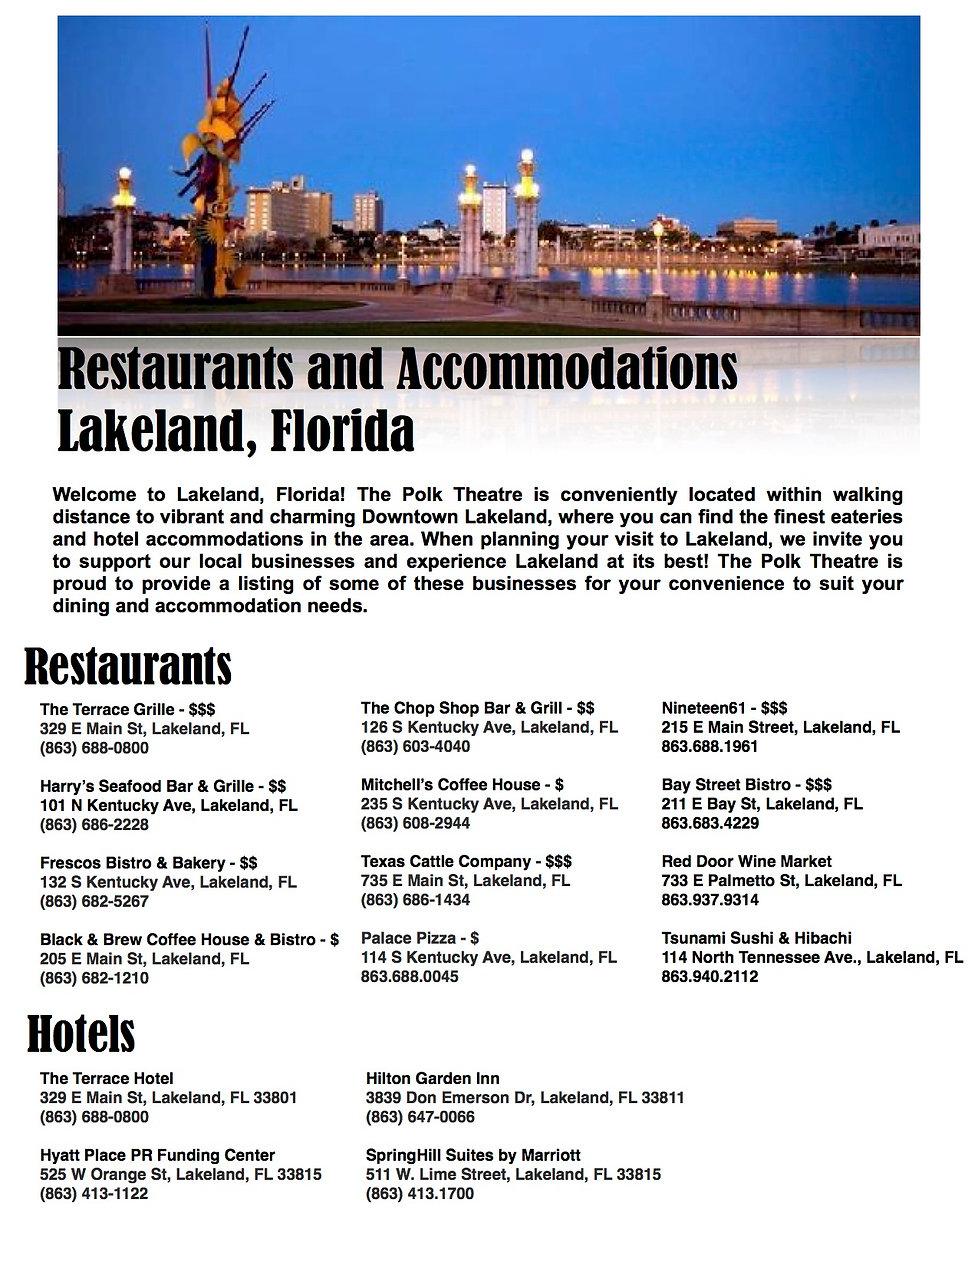 Restaurants & Accommodations.jpg